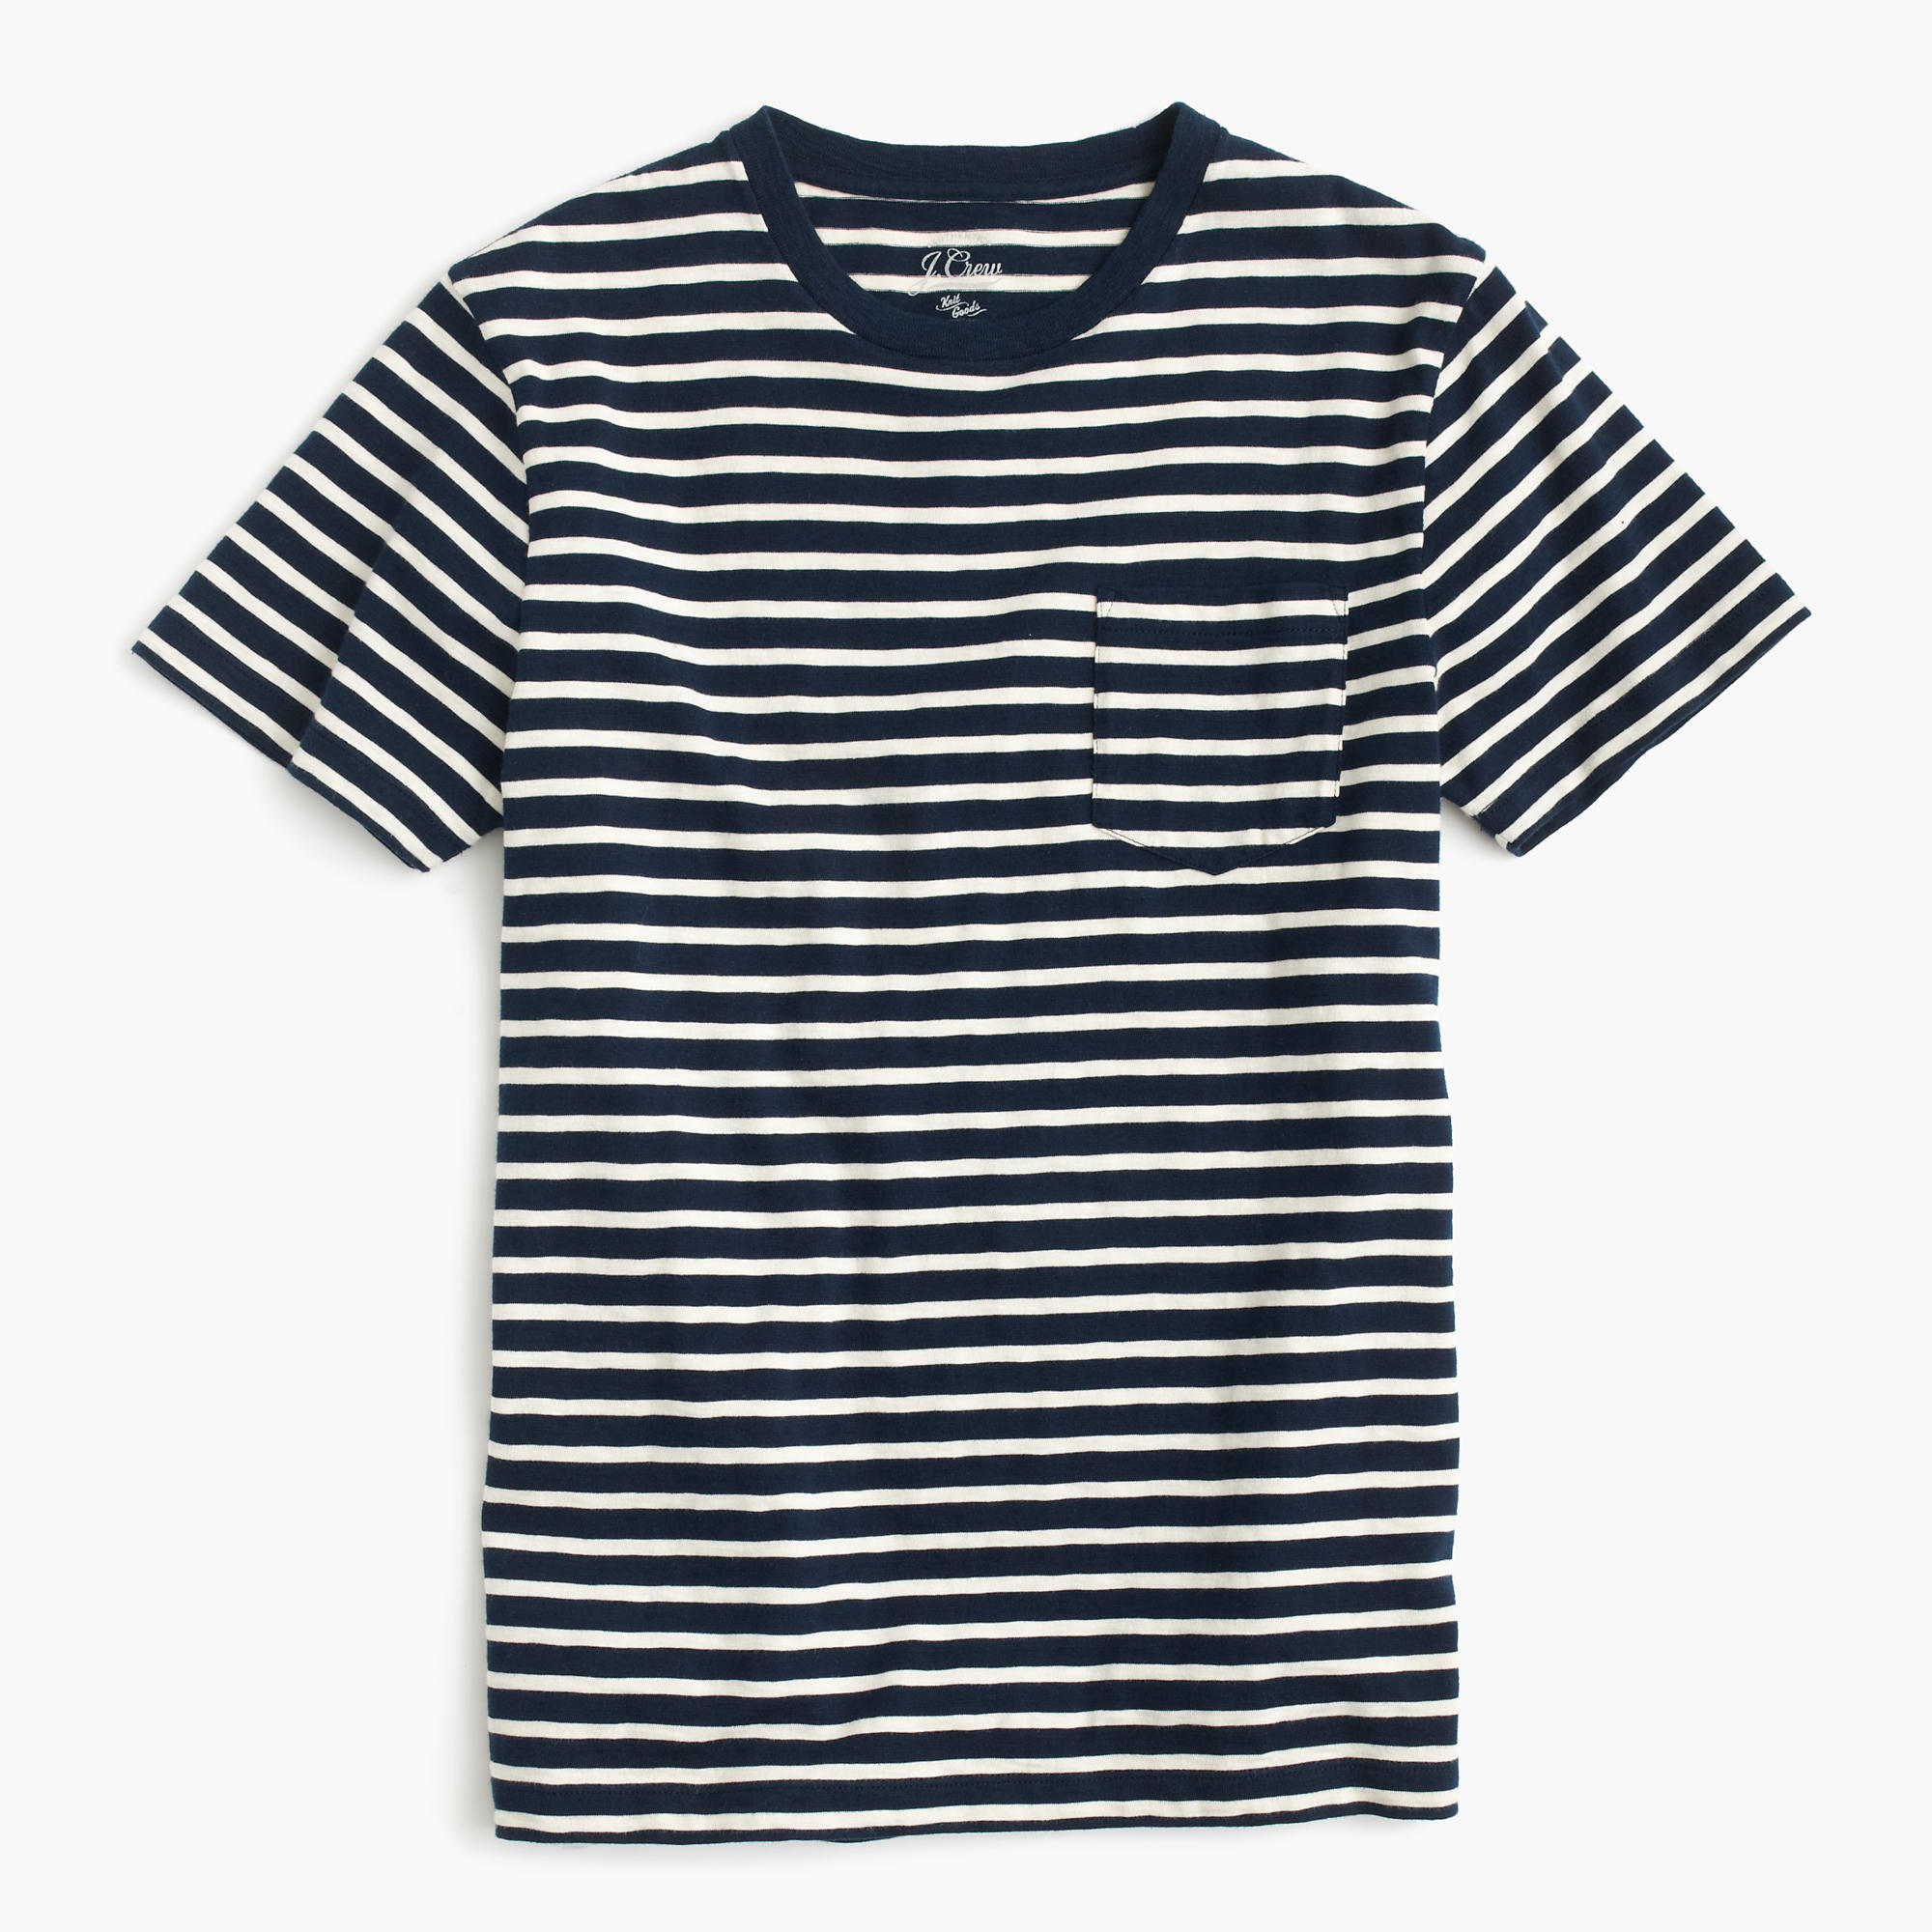 Slub cotton textured cotton pocket t shirt in blue stripe for Navy blue color shirt